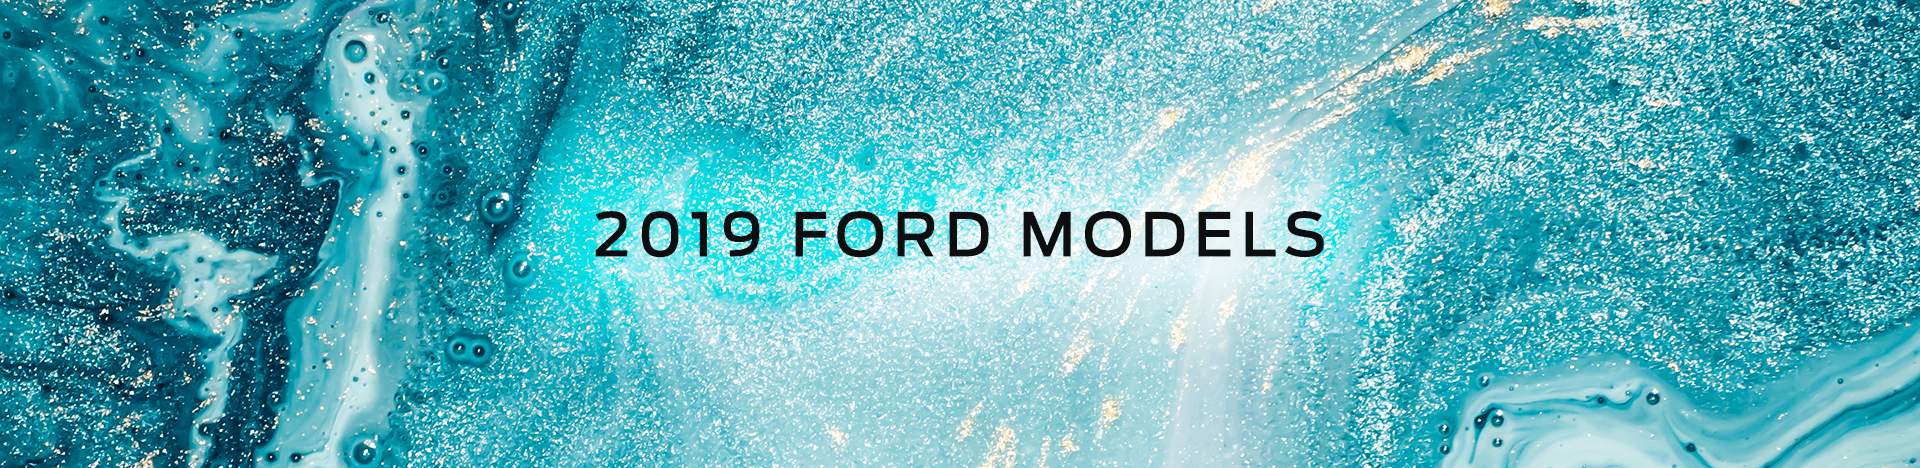 2019 Ford Models